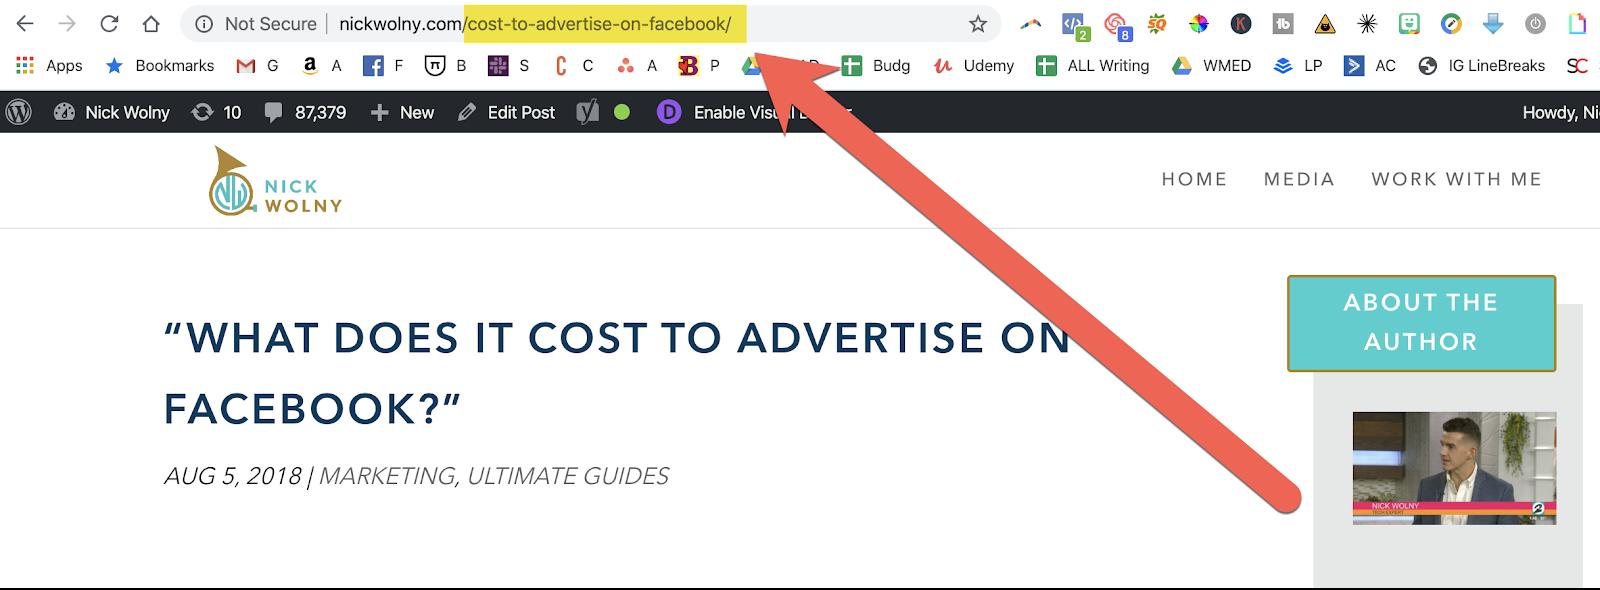 promote-content-slug